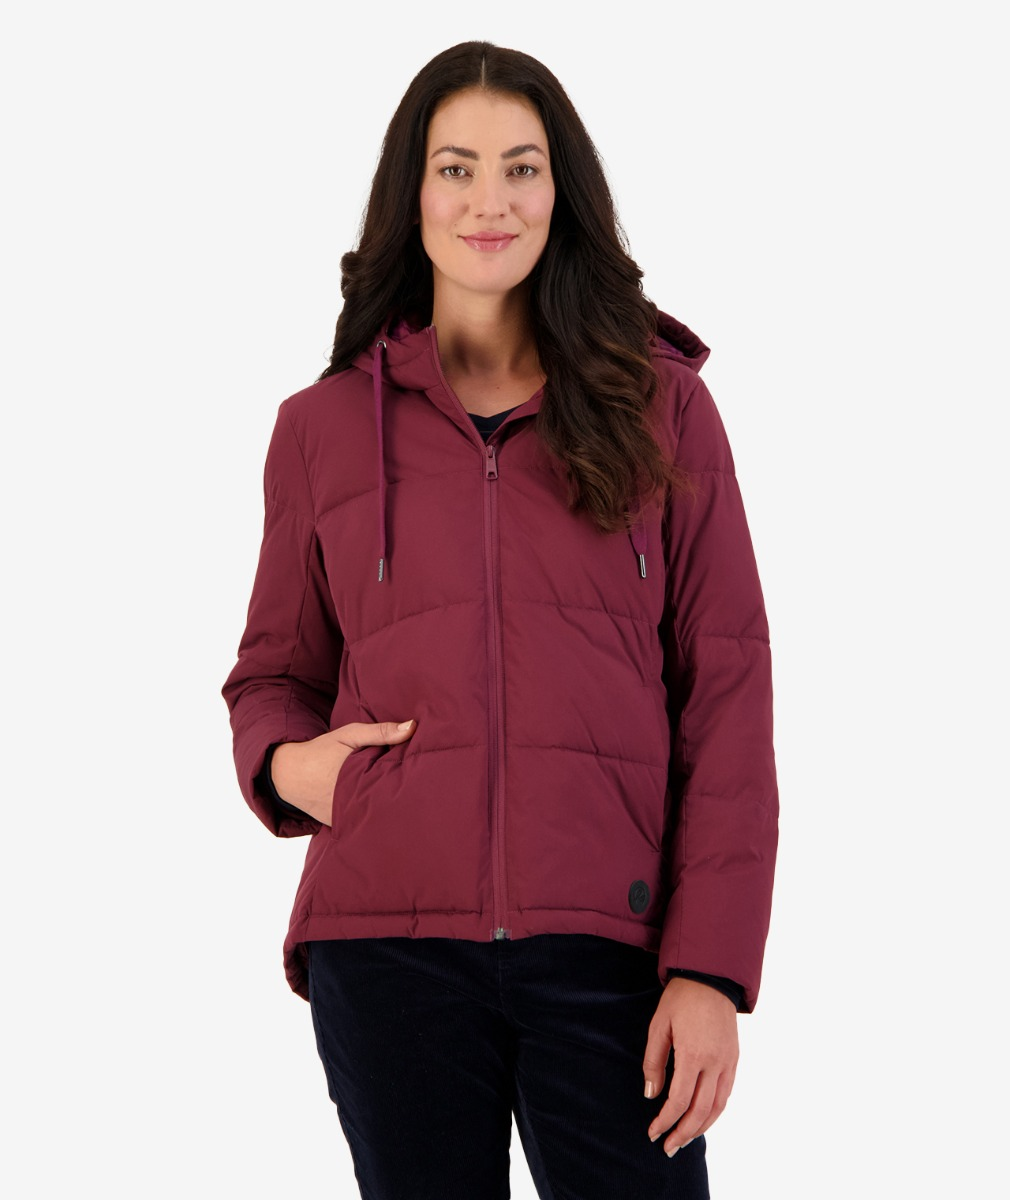 Swanndri Women's Lakeside Hooded Insulated Jacket in Plum